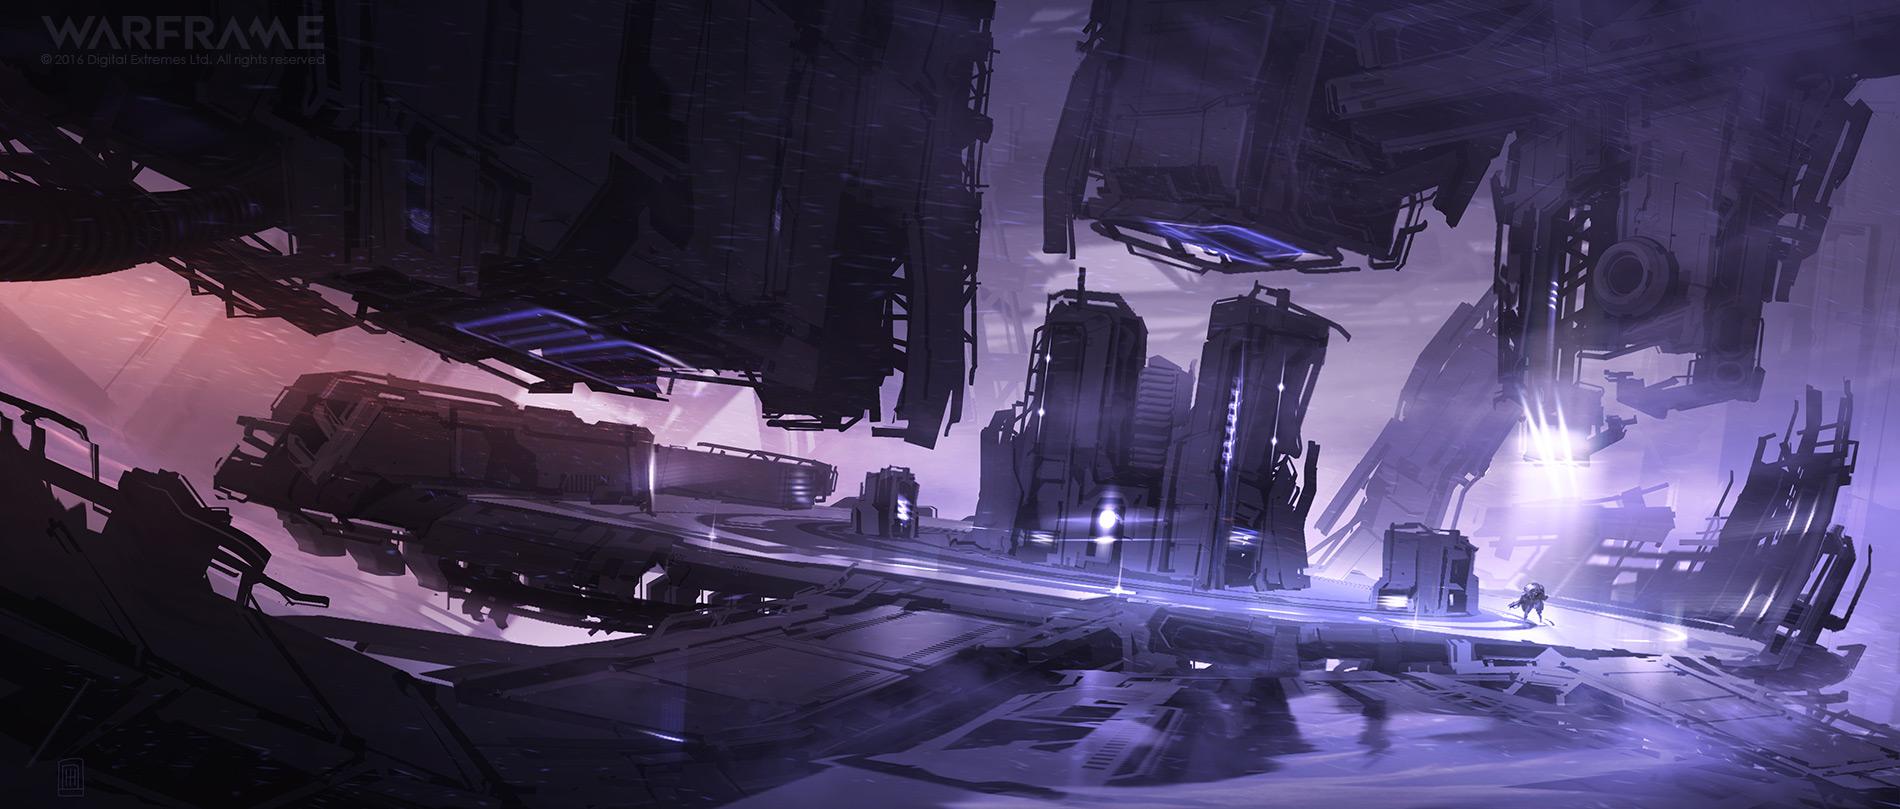 Warframe_Corpus_IcePlanet_Wreckage_LB